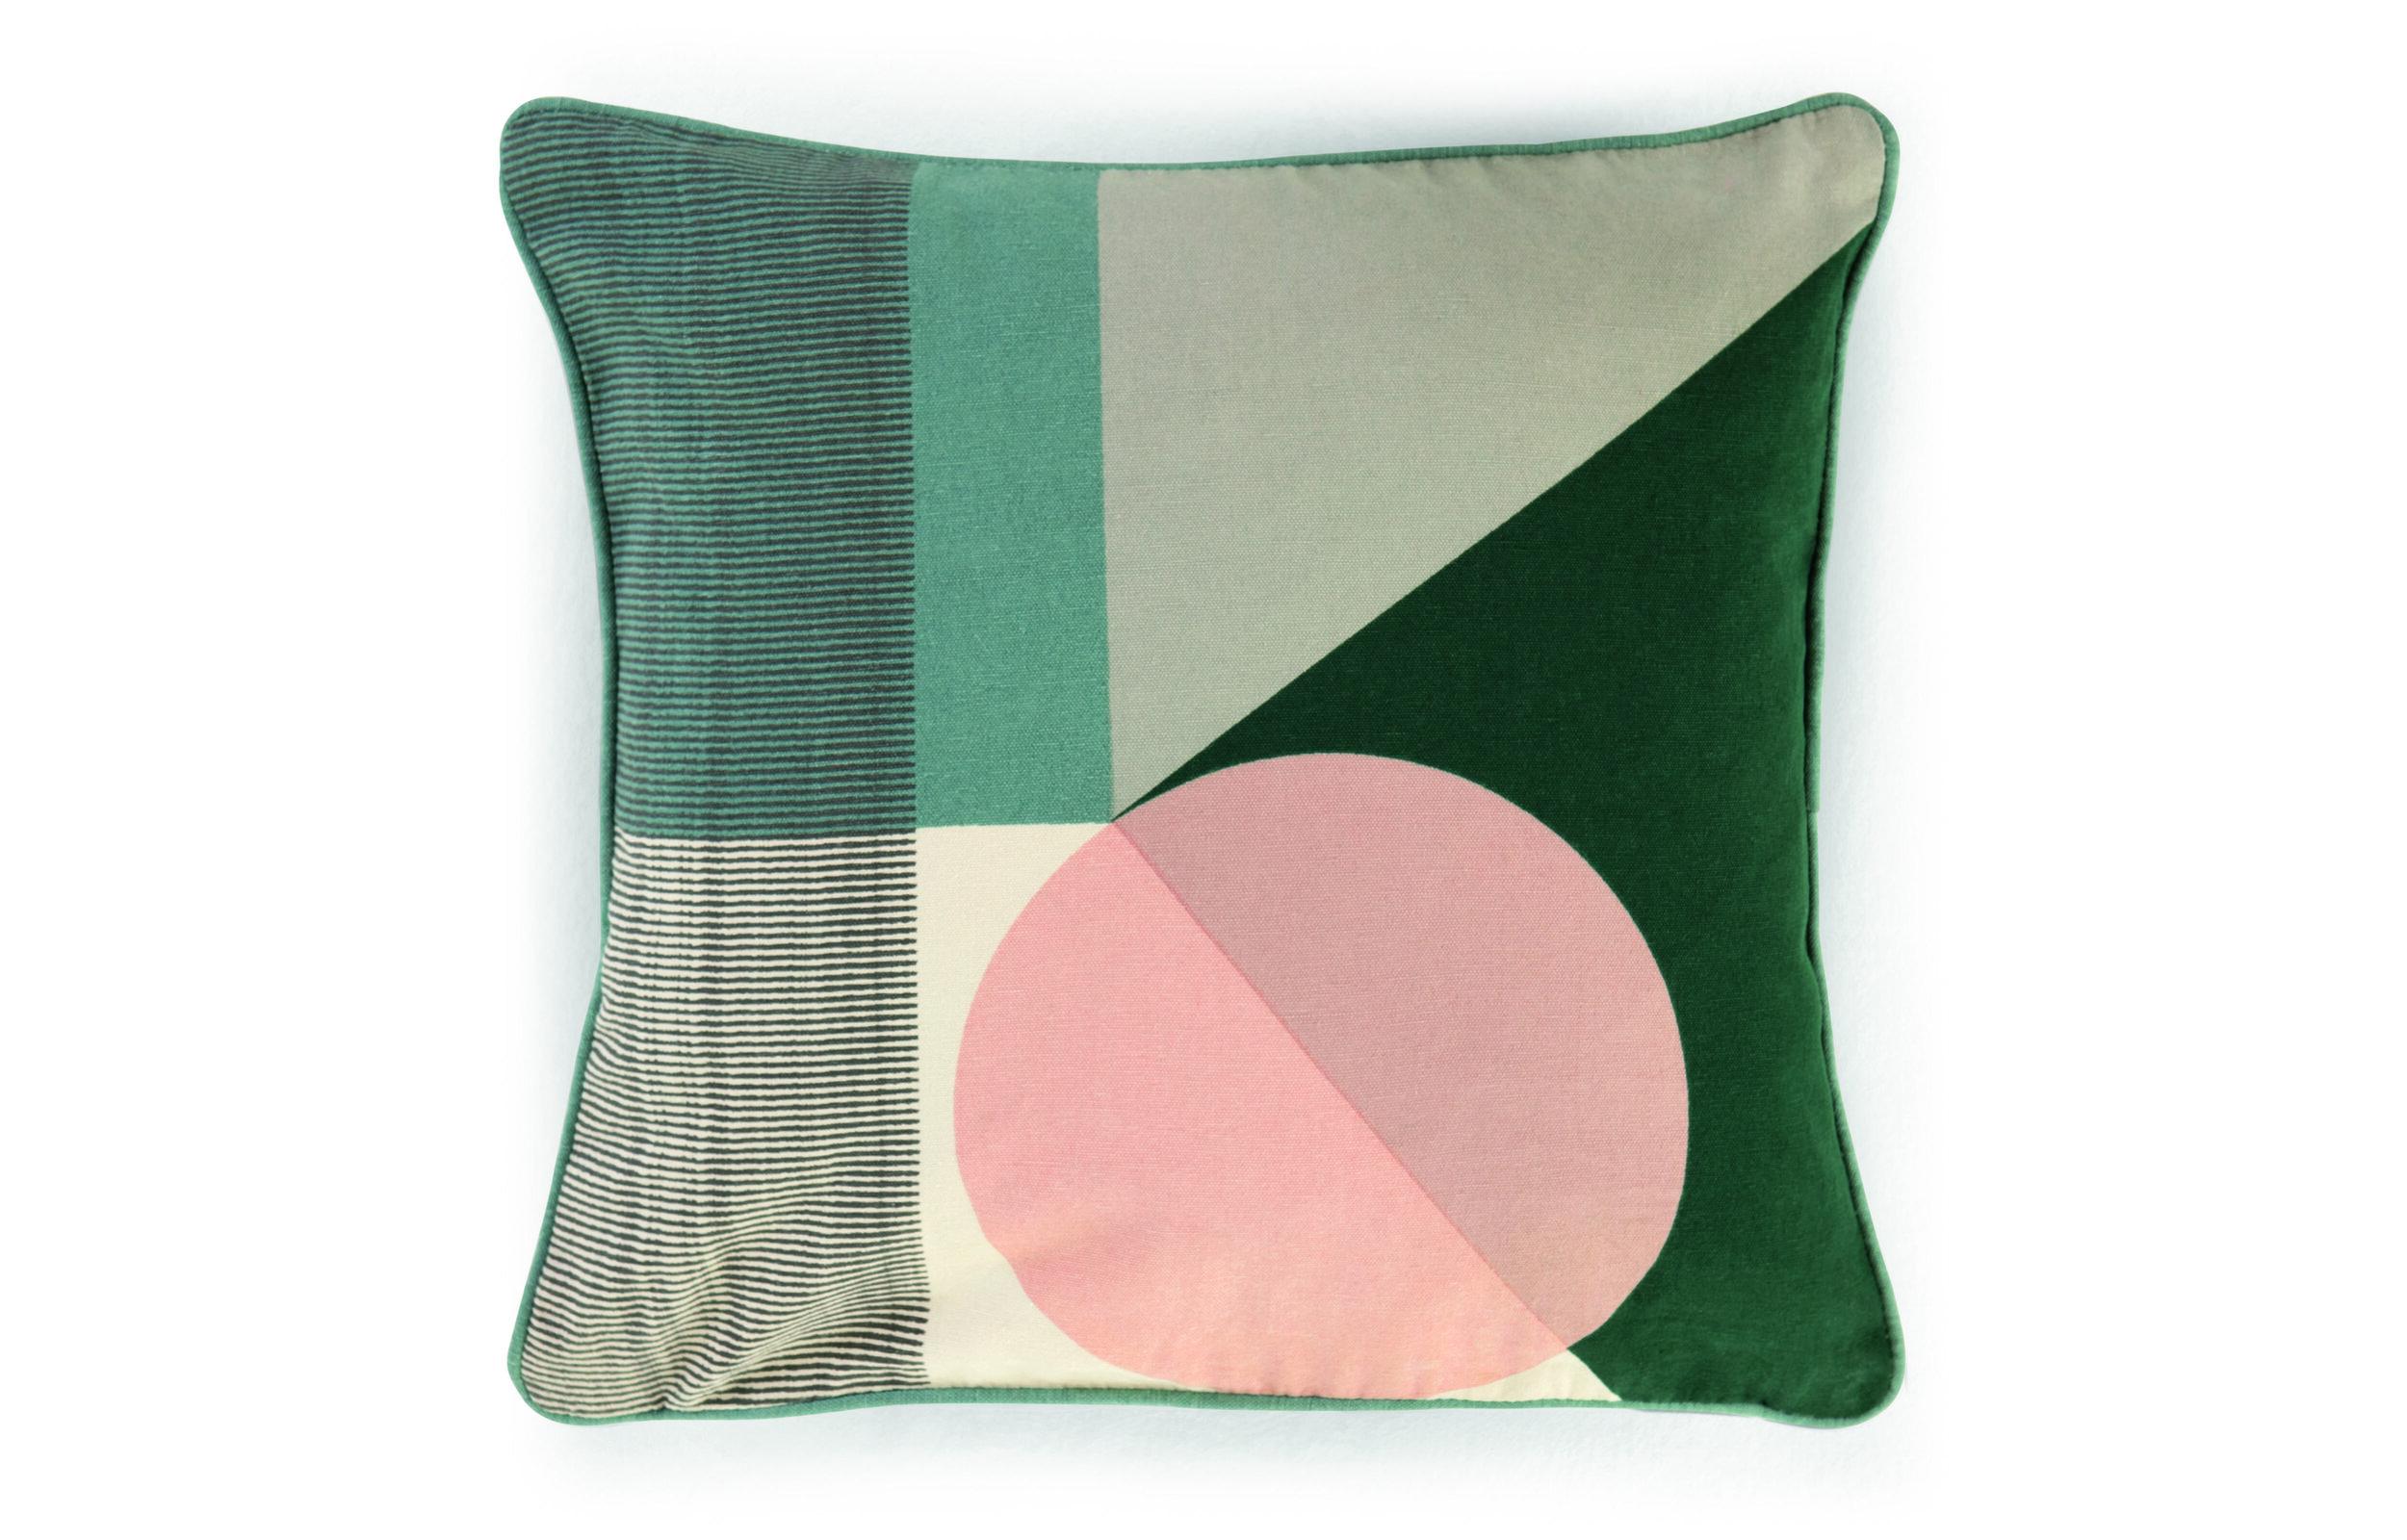 Made.com - Axle Printed Circle Cushion